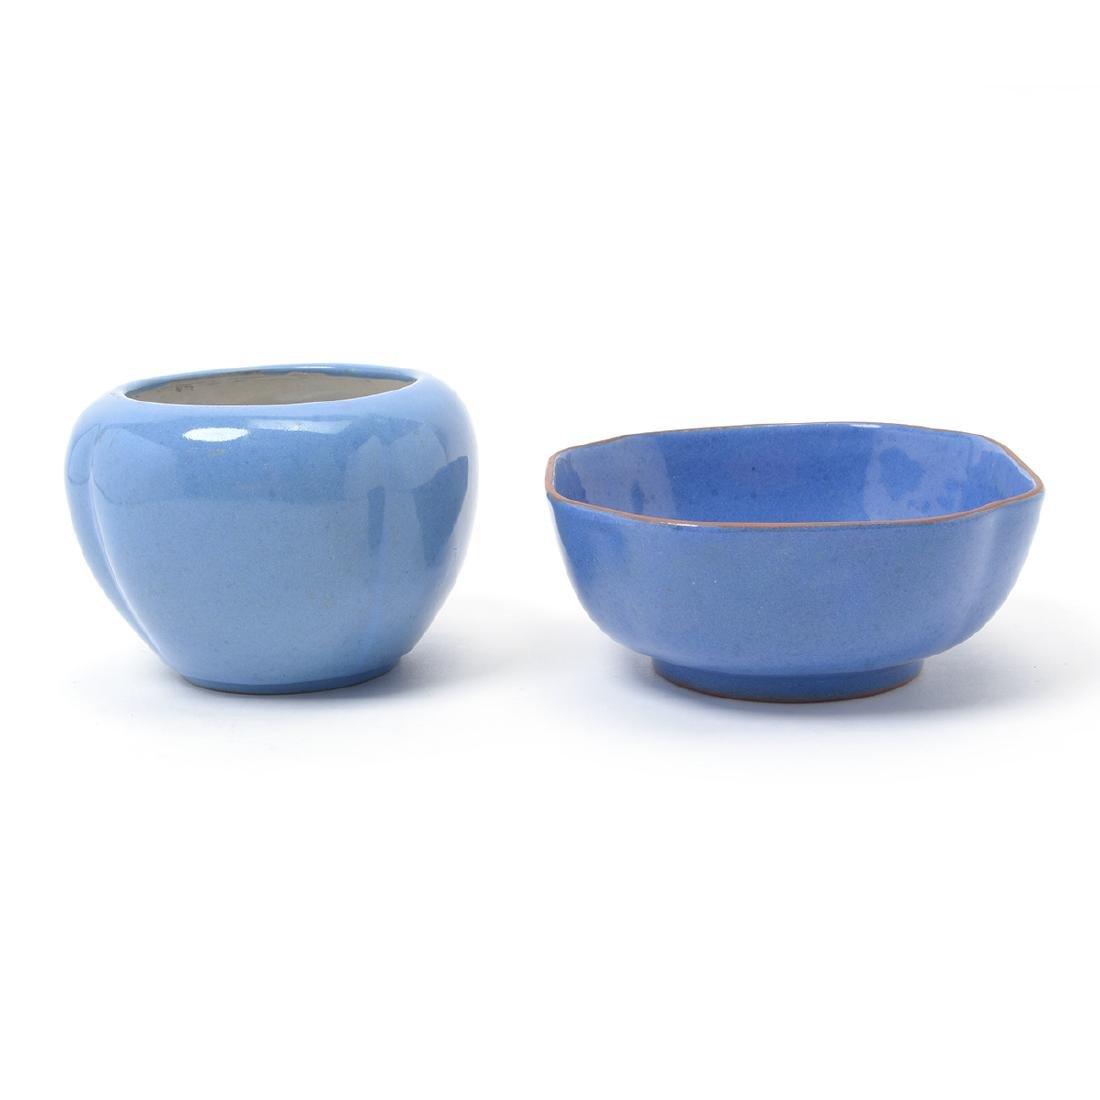 Two Blue Glazed Stoneware Bowls